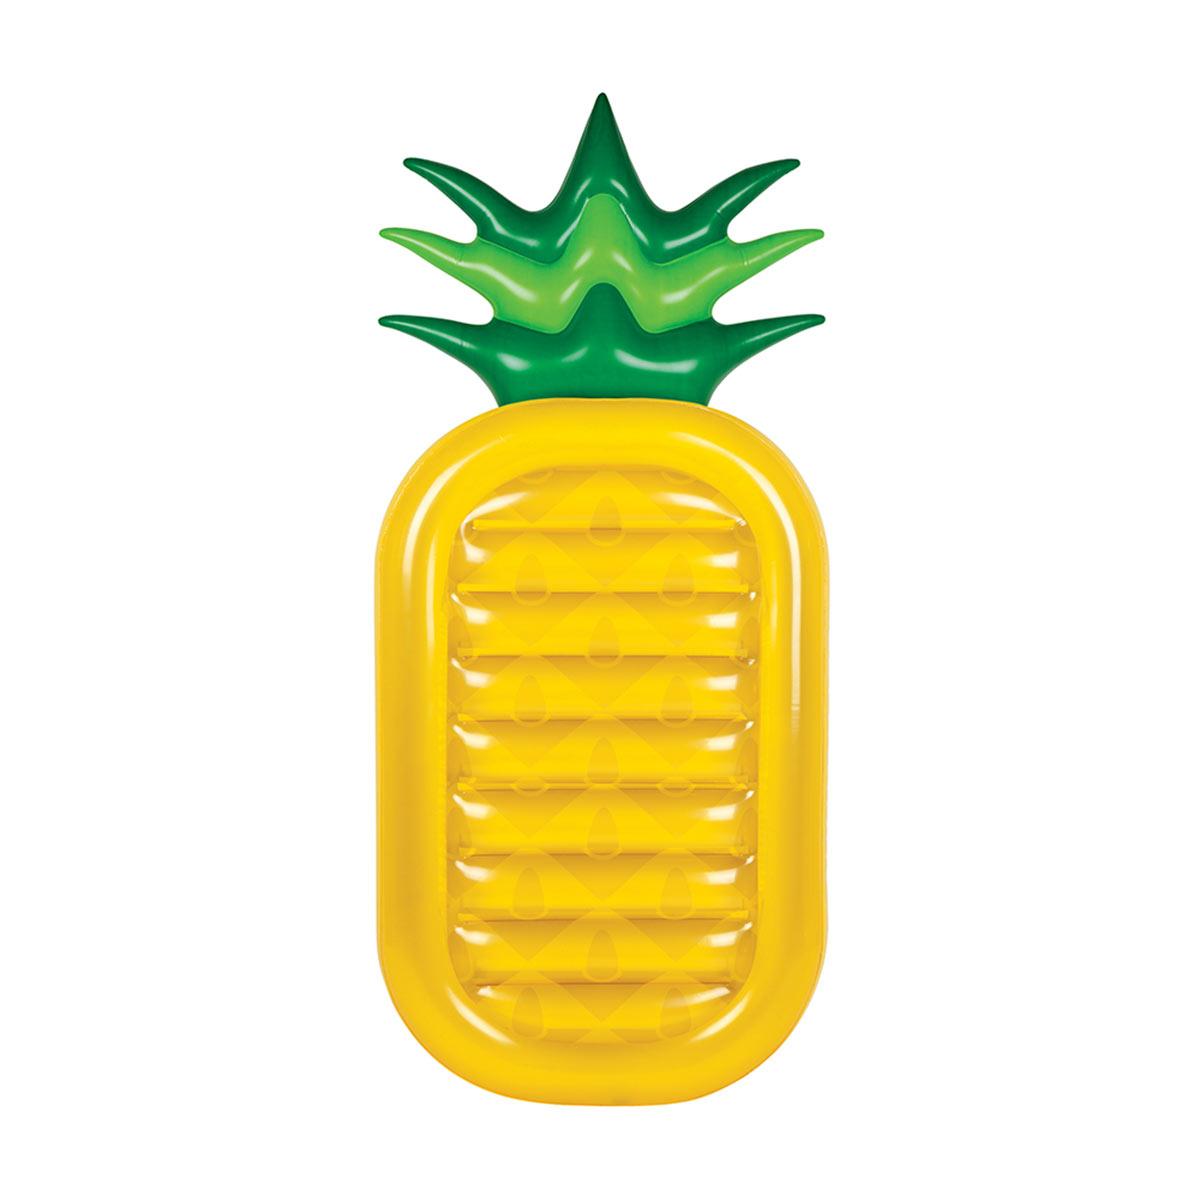 Bouée ananas jaune gonflable